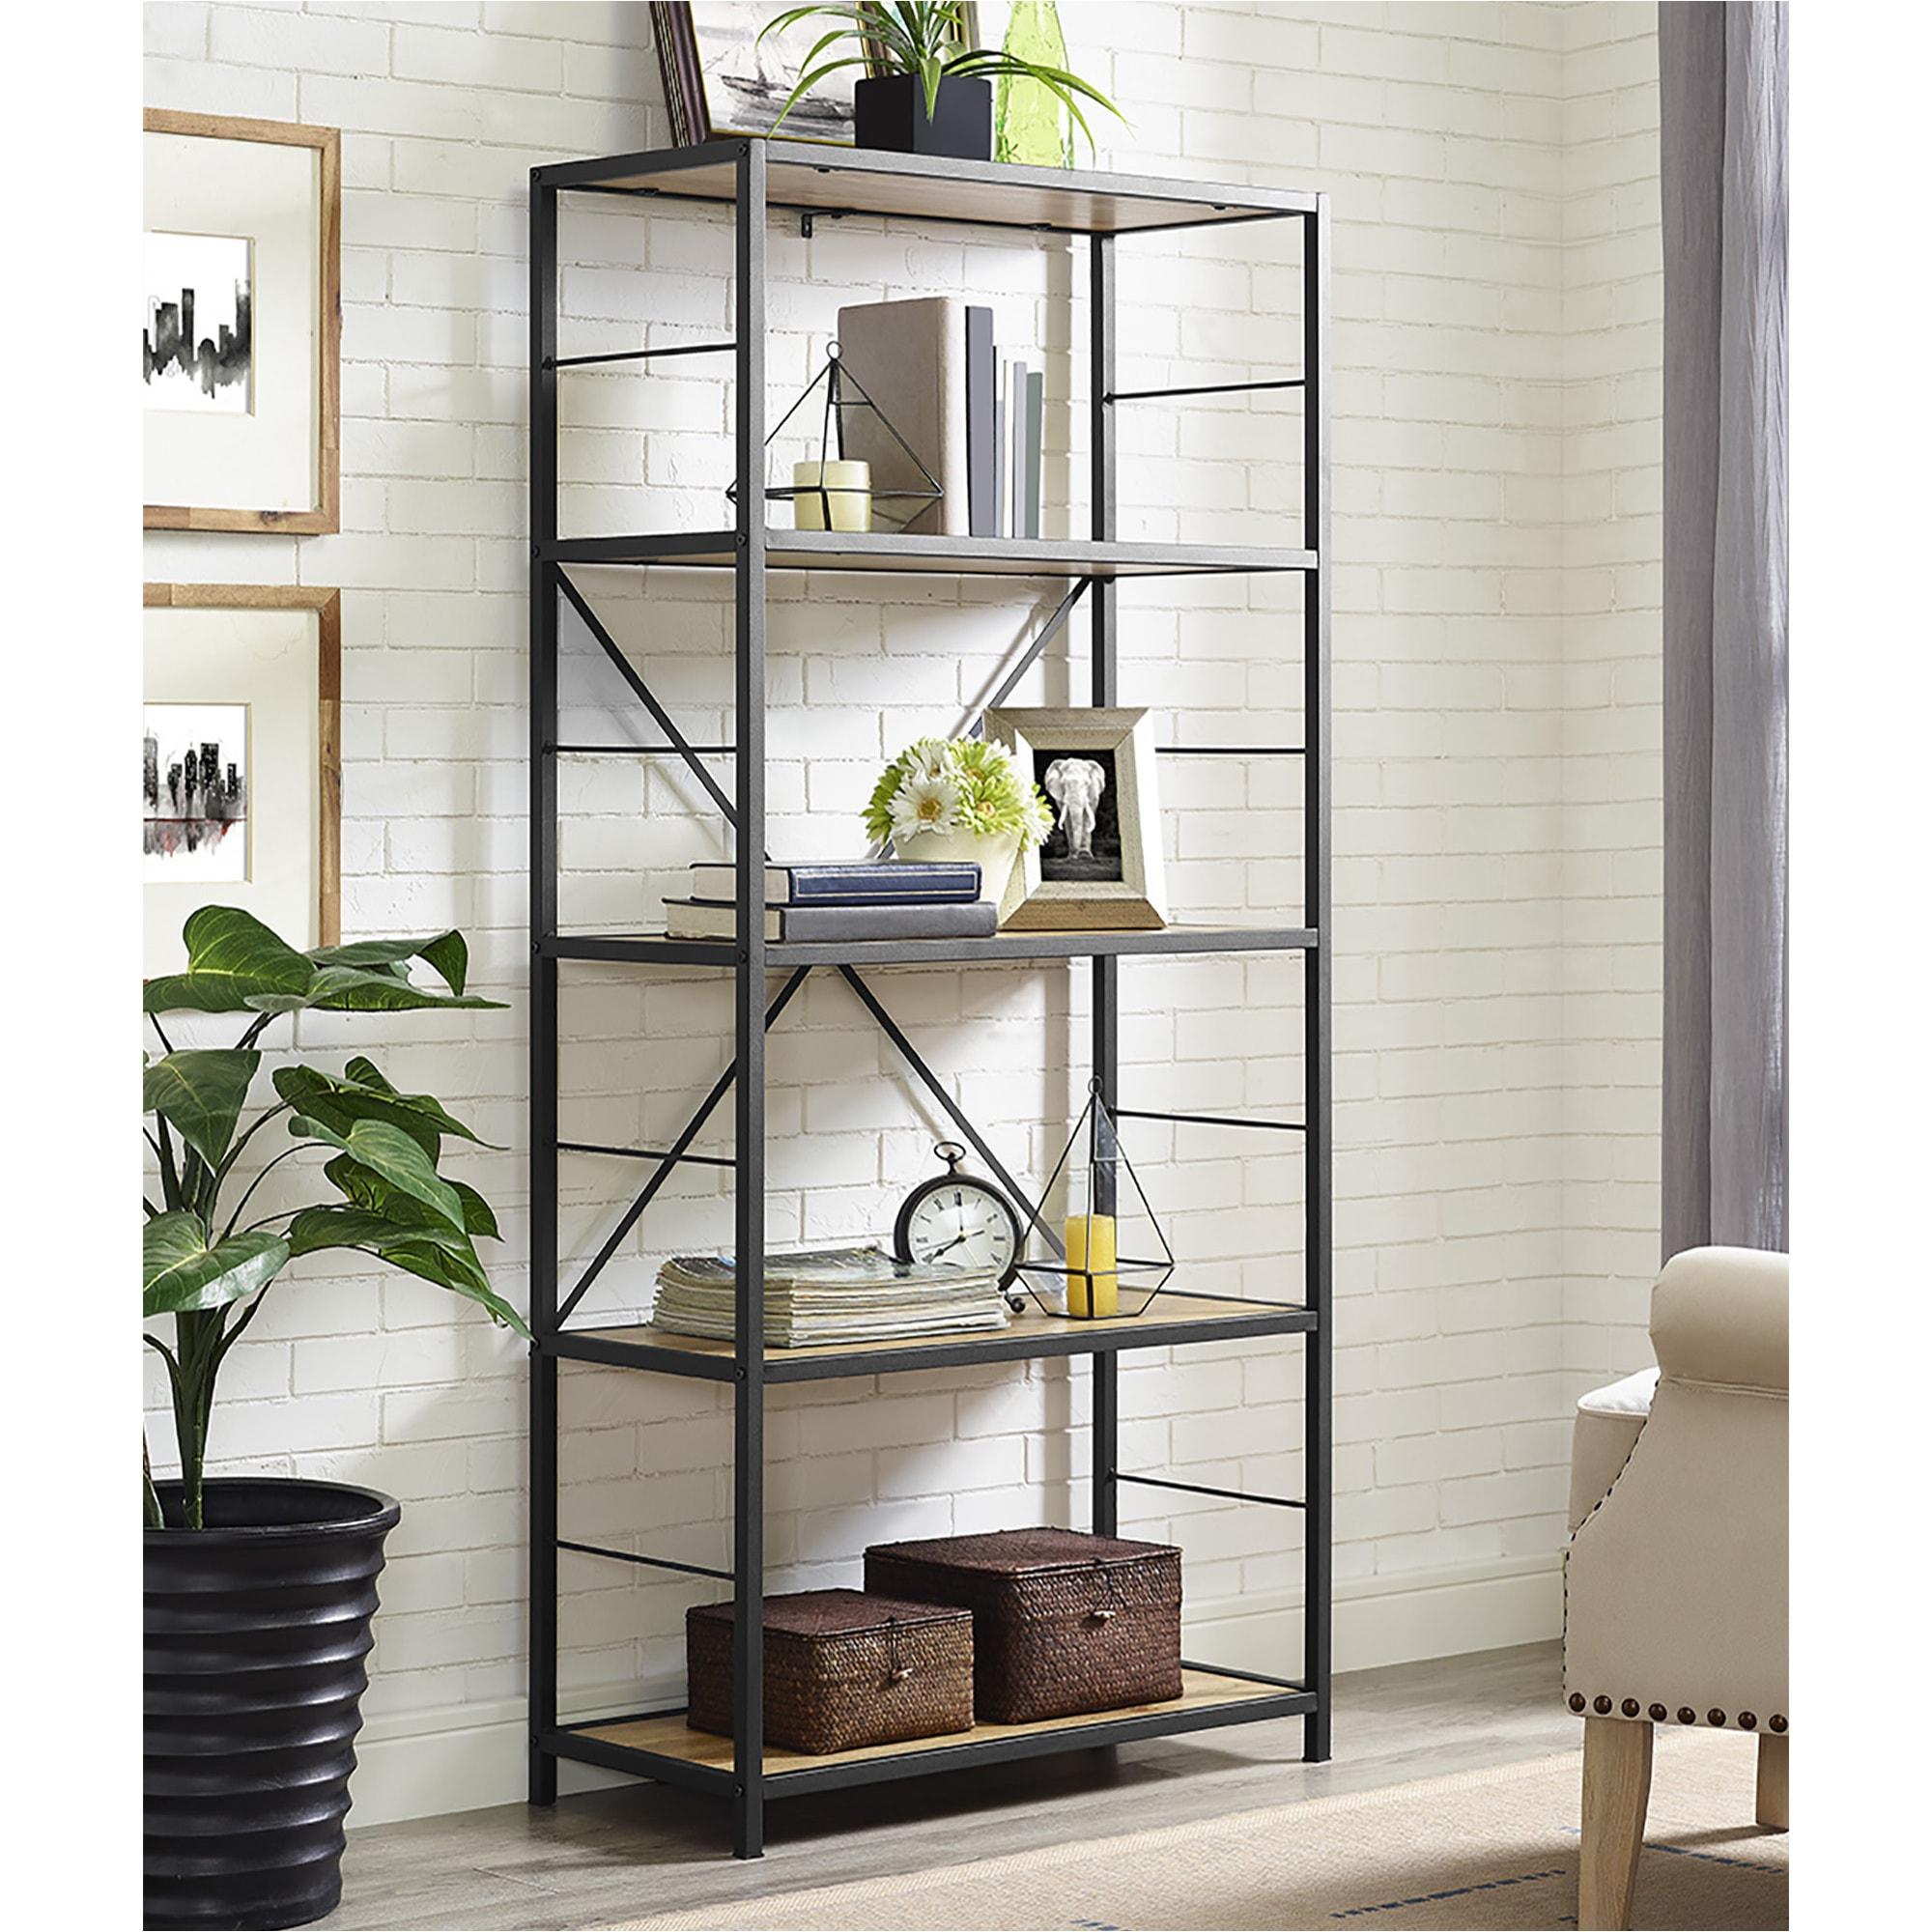 63 Inch Rustic Metal And Wood Media Bookshelf